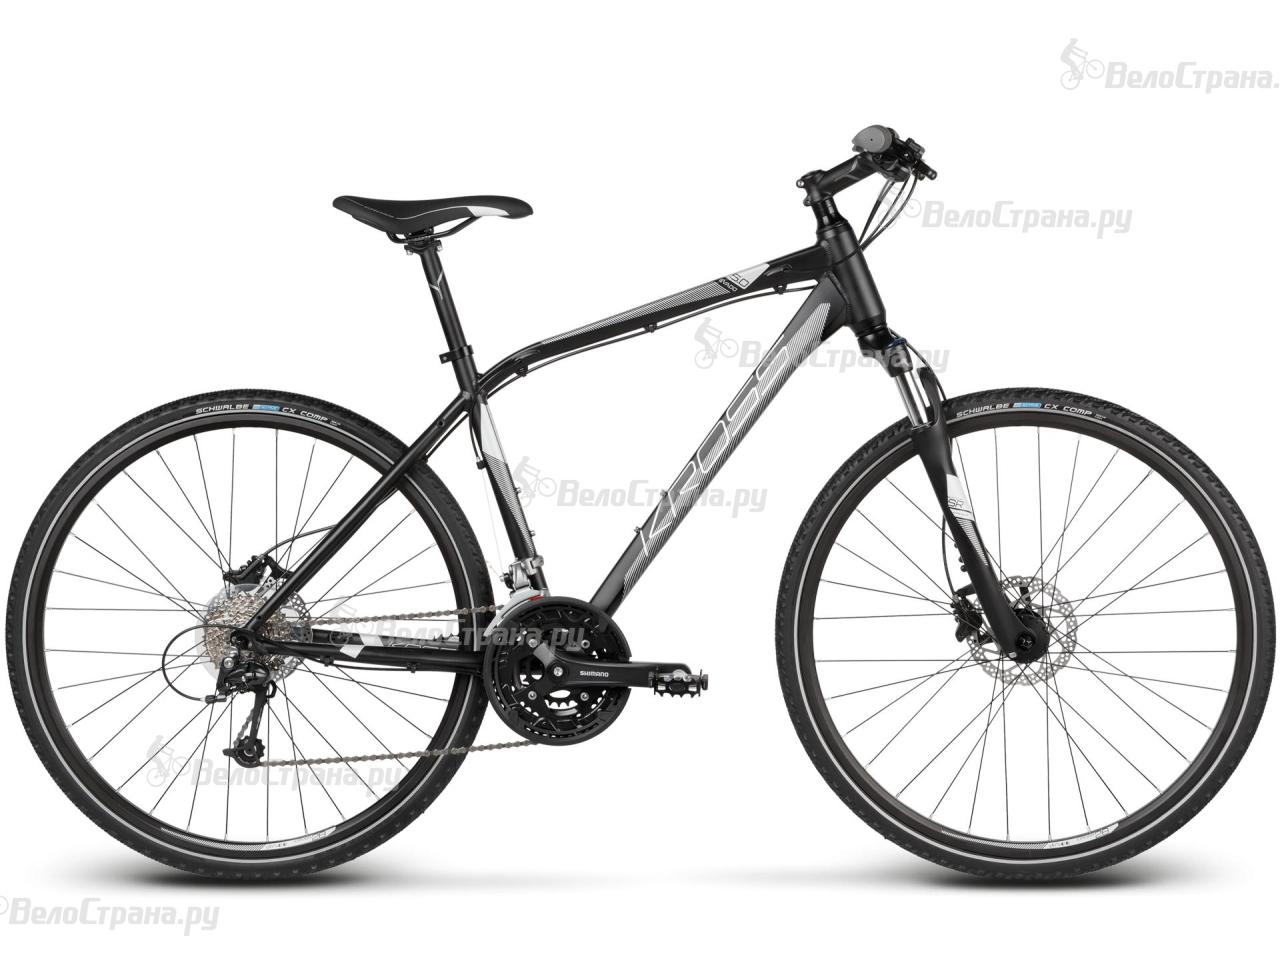 Велосипед Kross Evado 5.0 (2017) велосипед kross evado 6 0 2016